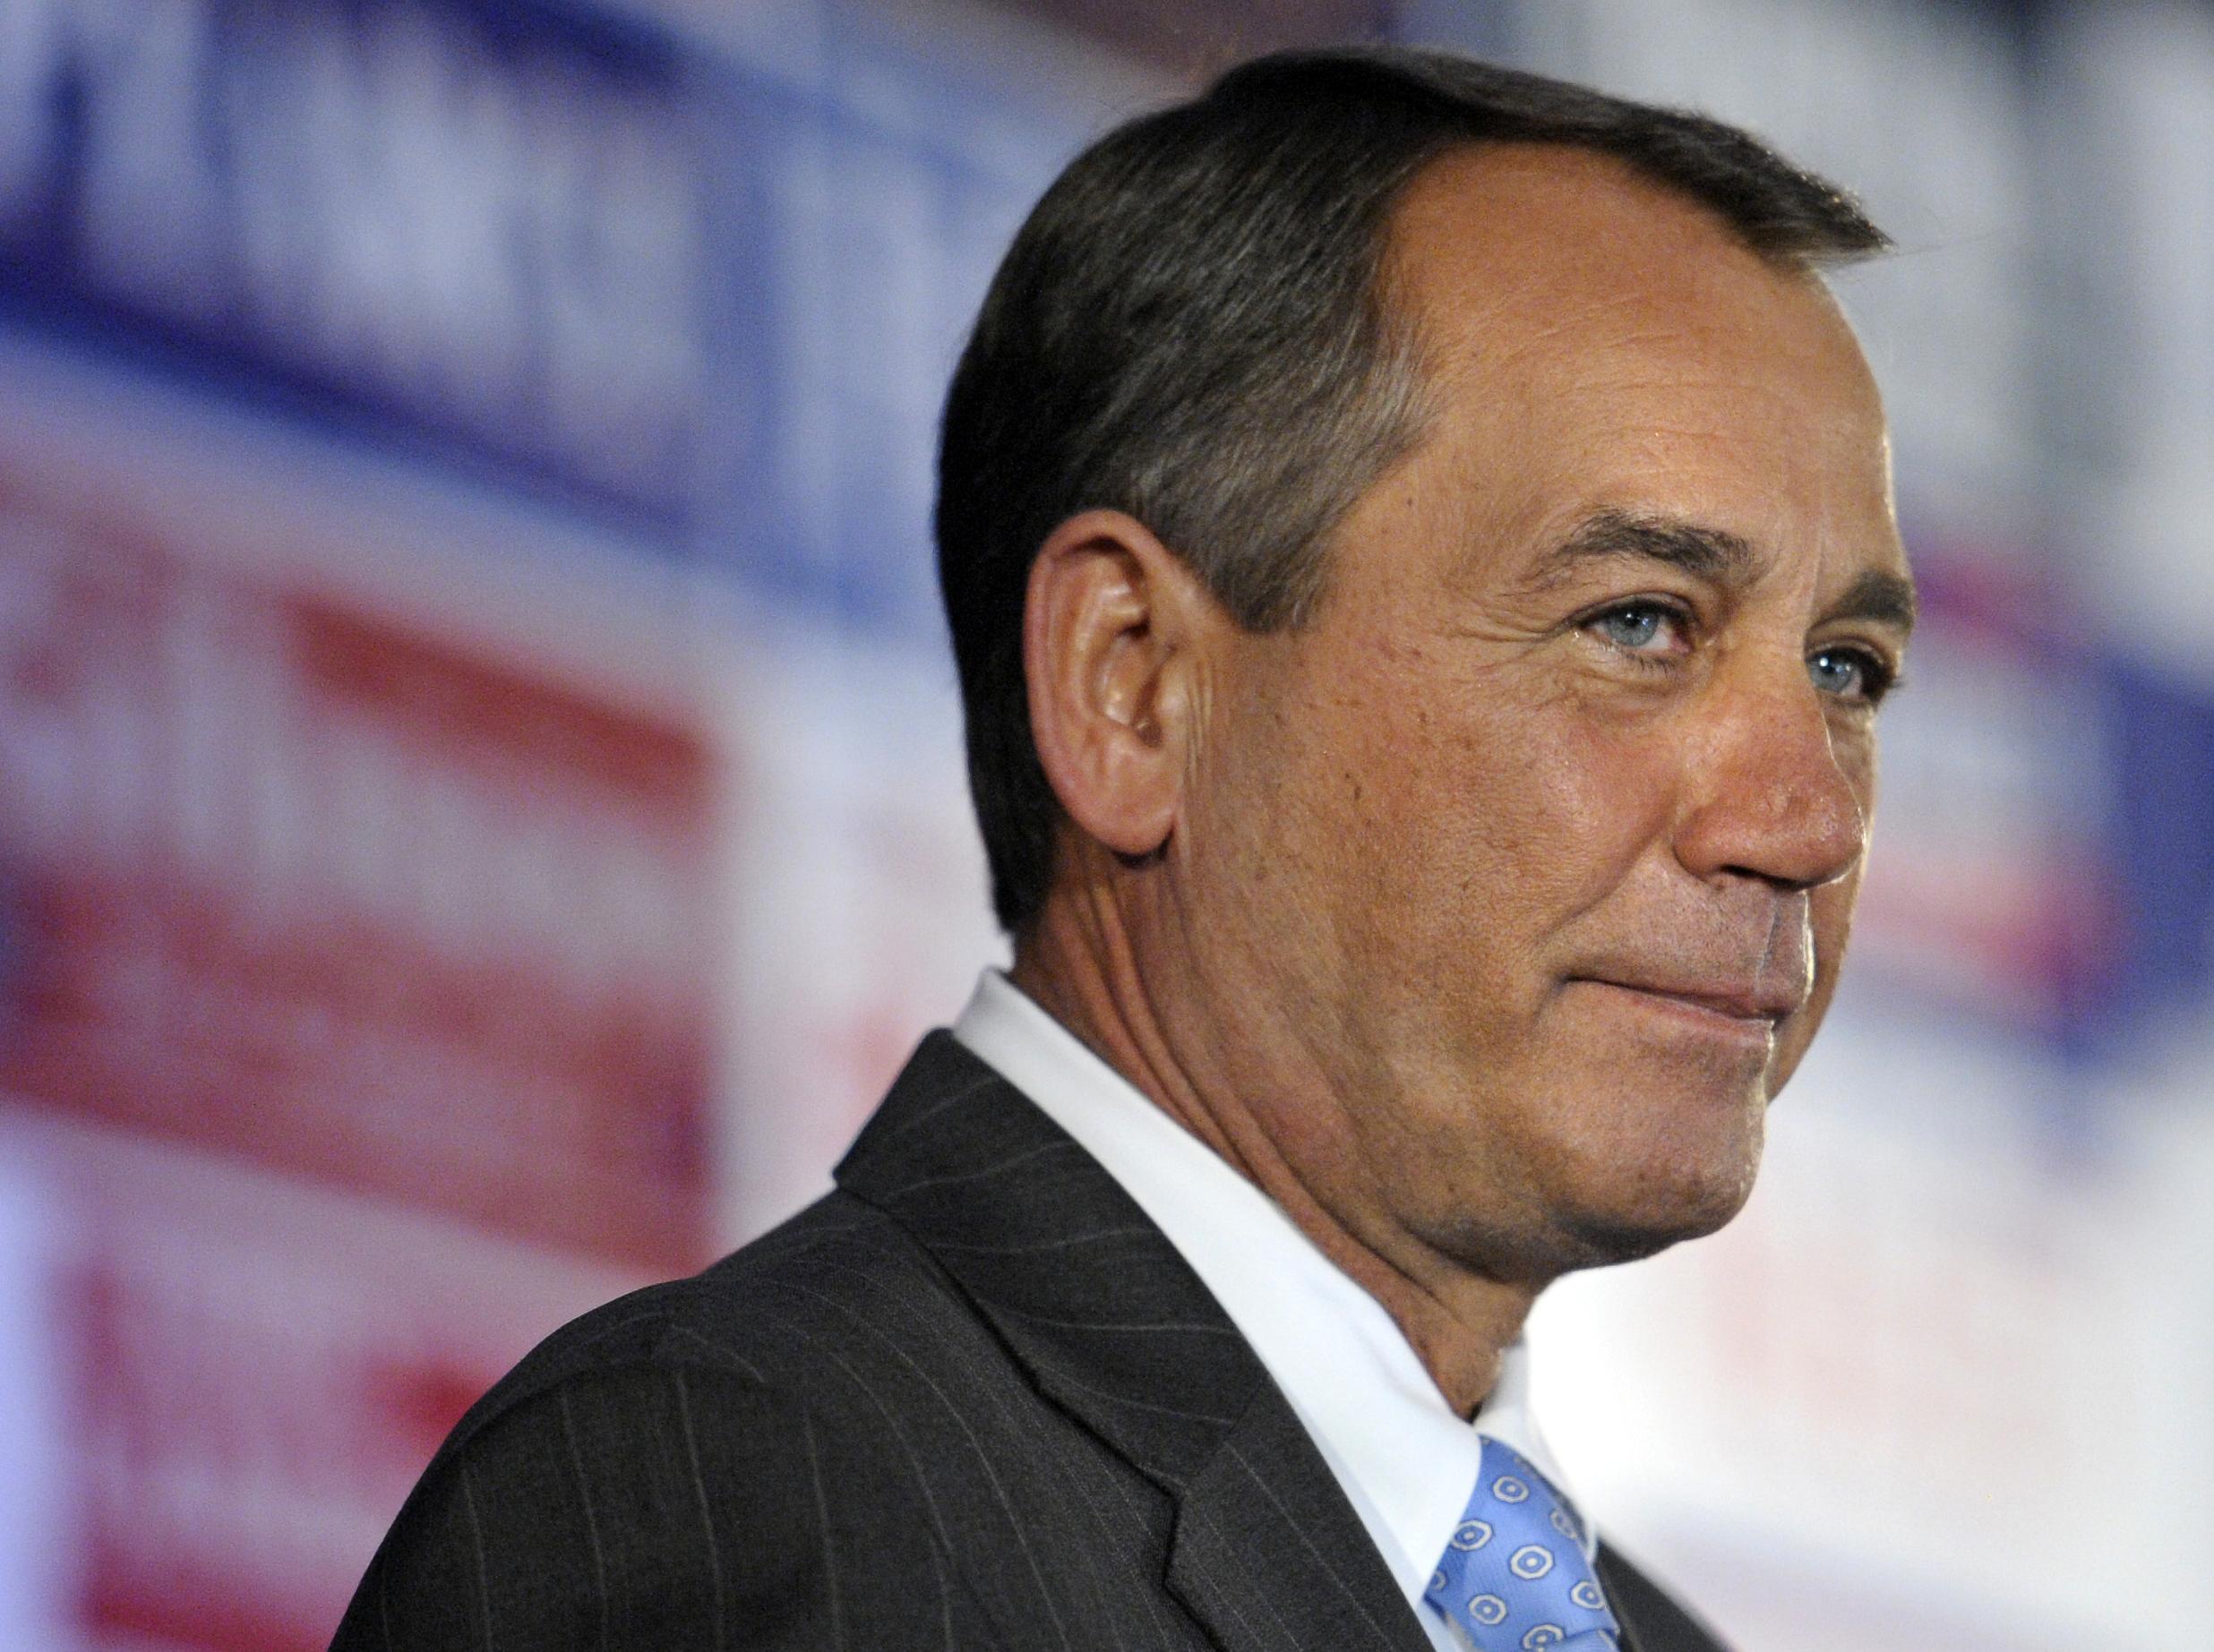 Up The Establishment: GOP Powerman Eric Cantor Loses Re-Election Bid to Tea Partier